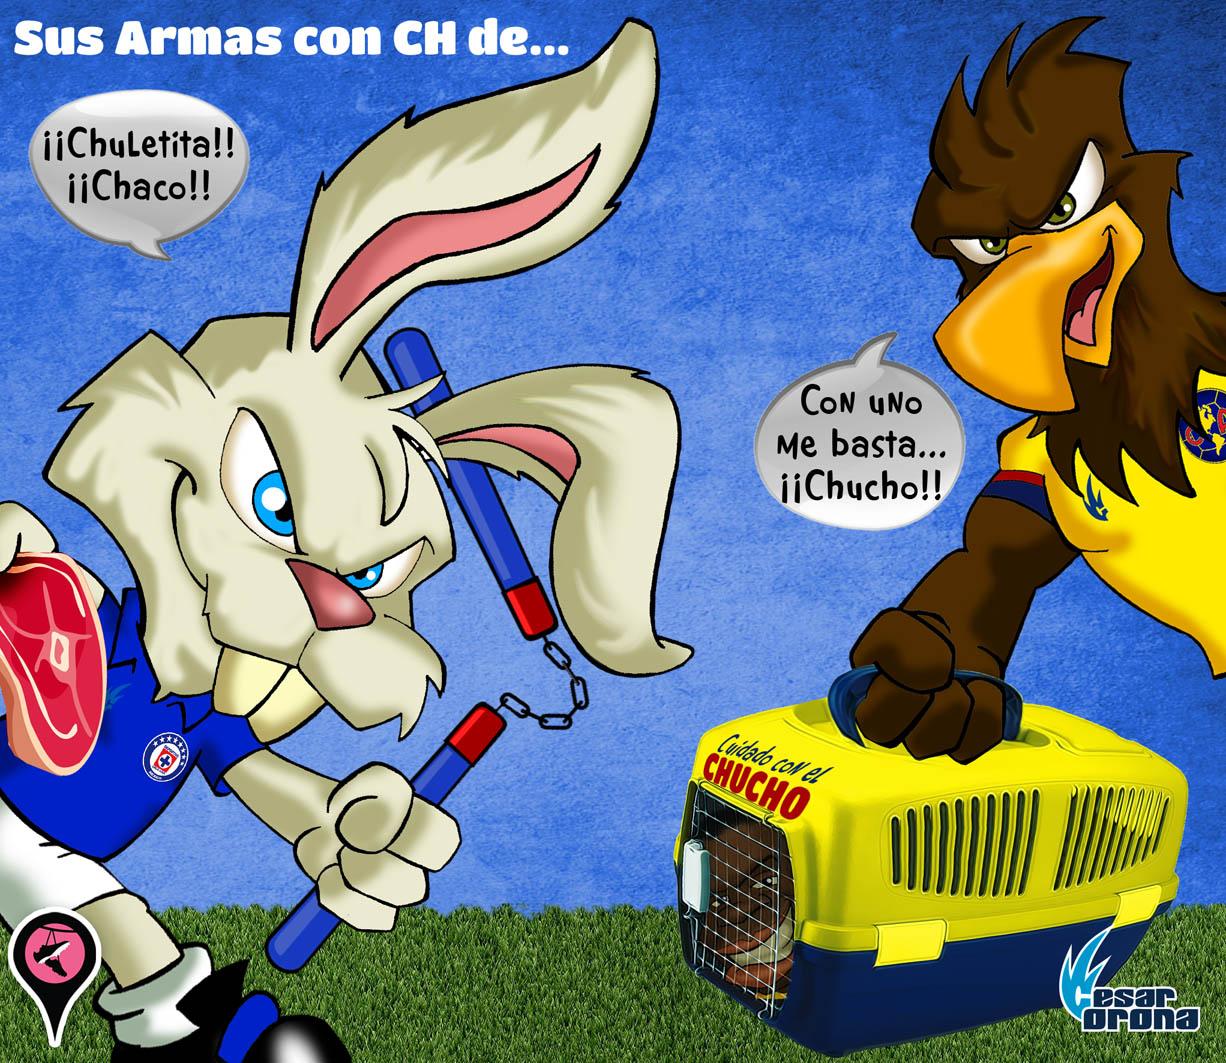 Cruz Azul vs América con CH de.........